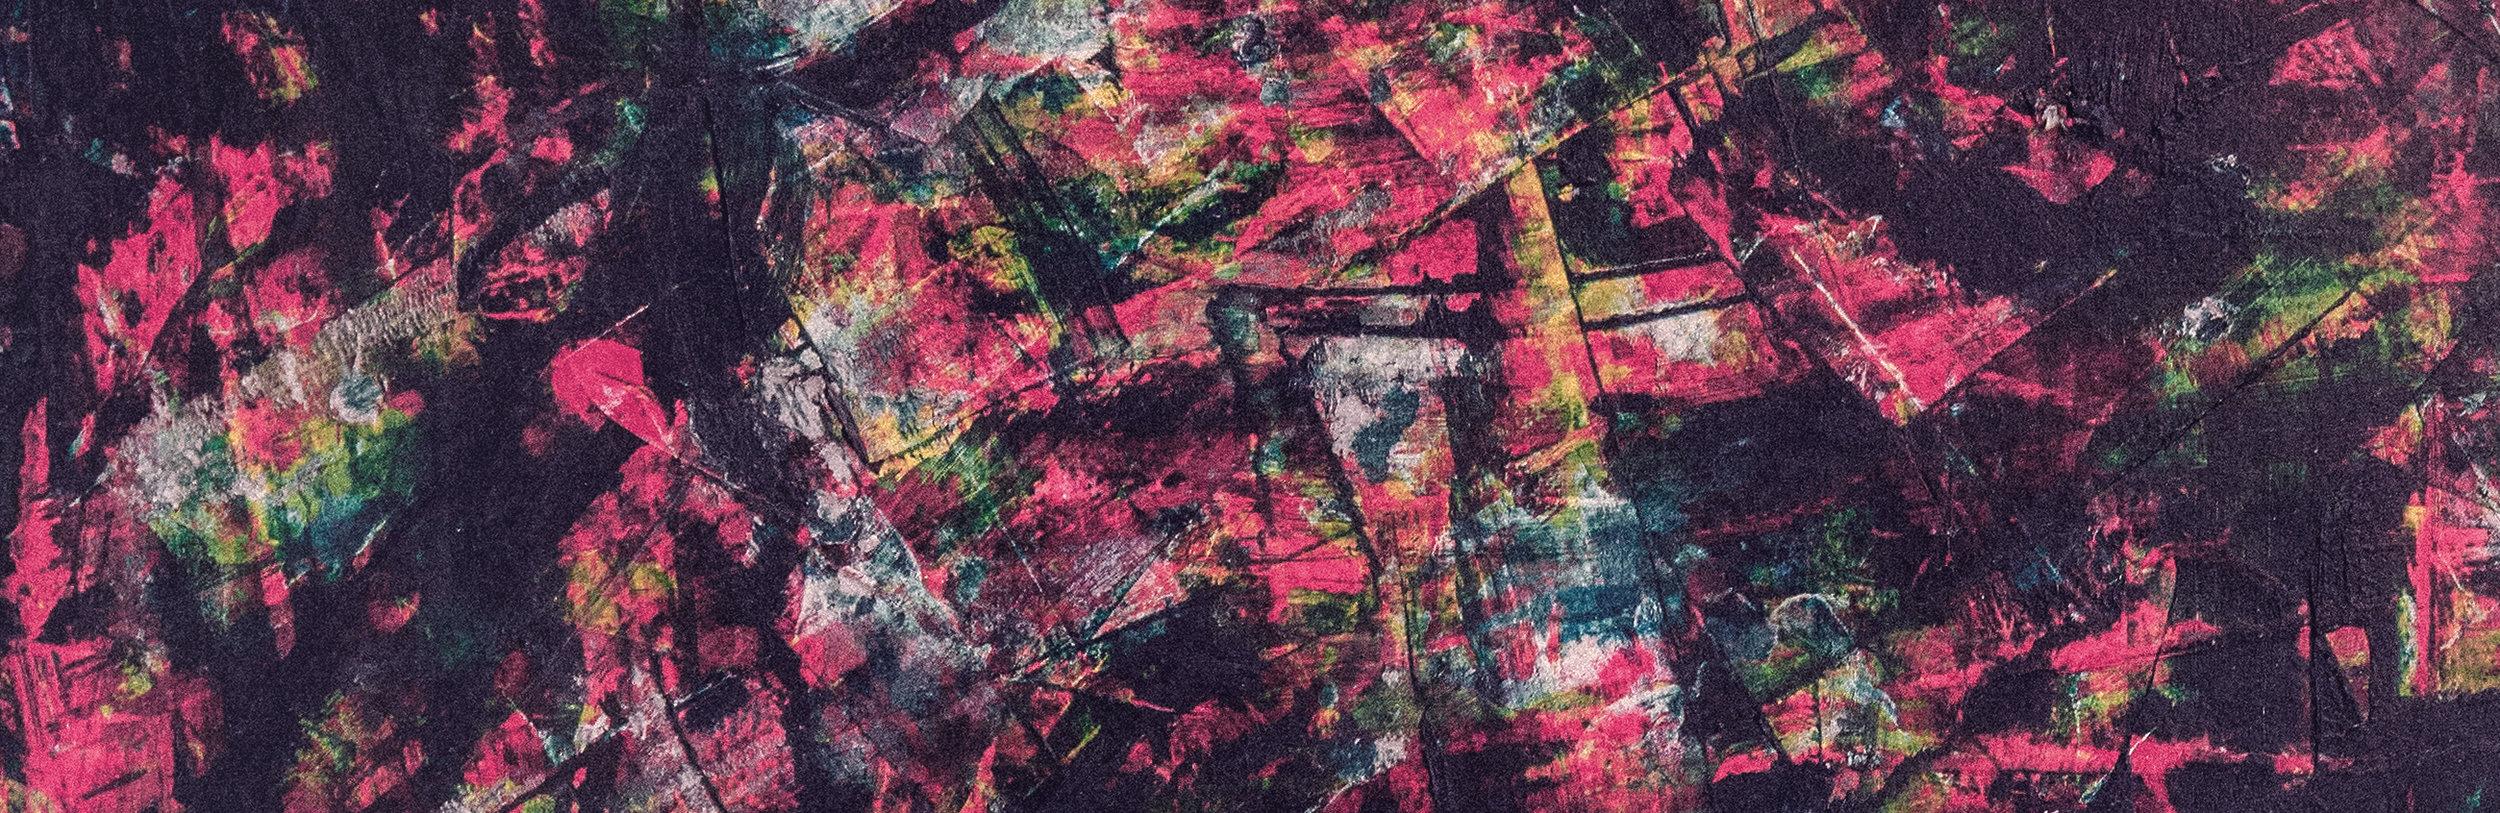 bonjourmolotov+Saudade+Illustration+Ilustracao+painting+pintura+acrylic+acrílico+canvas+tela+paper+cardboard+mdf+Andre+Gigante+02NC.jpg